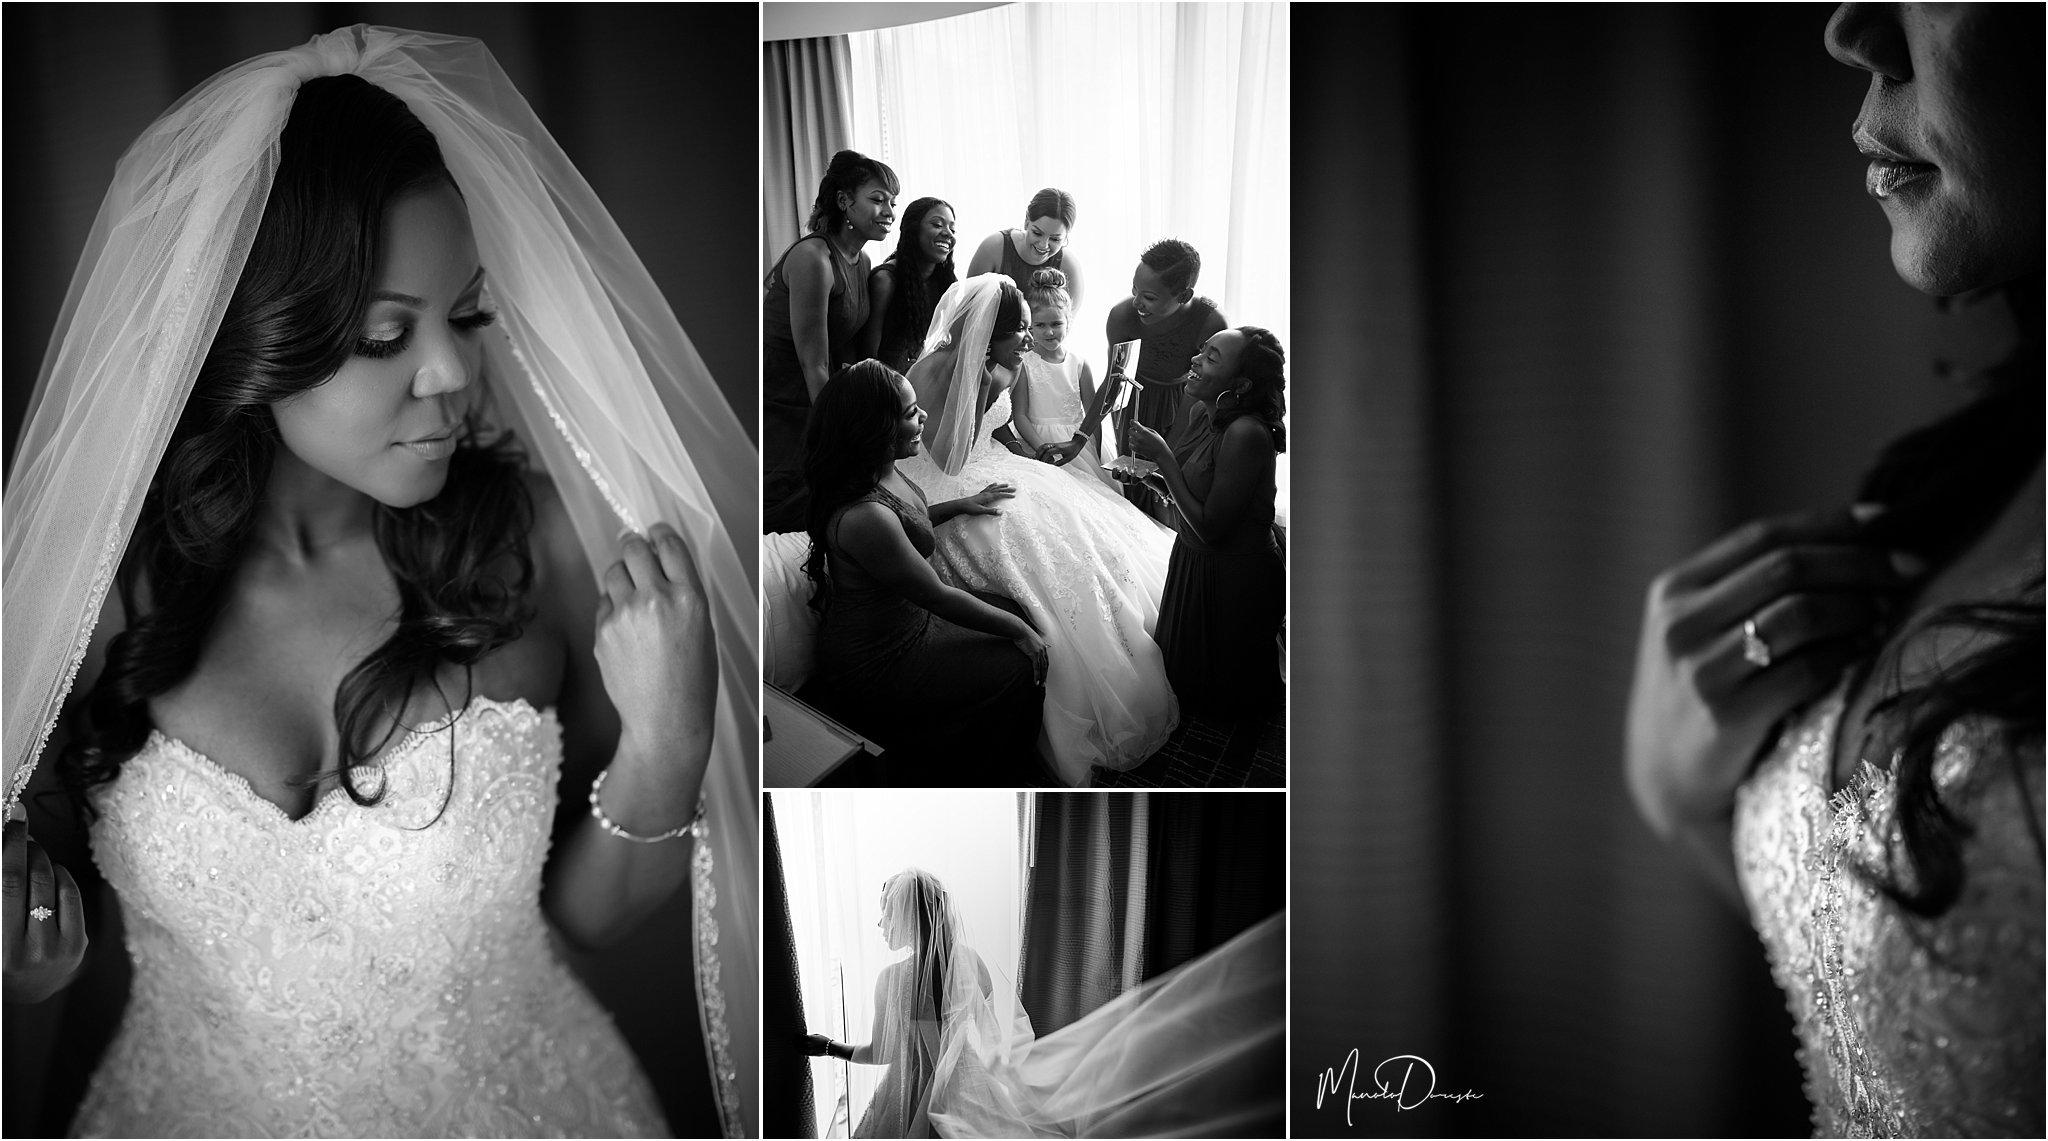 0116_ManoloDoreste_InFocusStudios_Wedding_Family_Photography_Miami_MiamiPhotographer.jpg